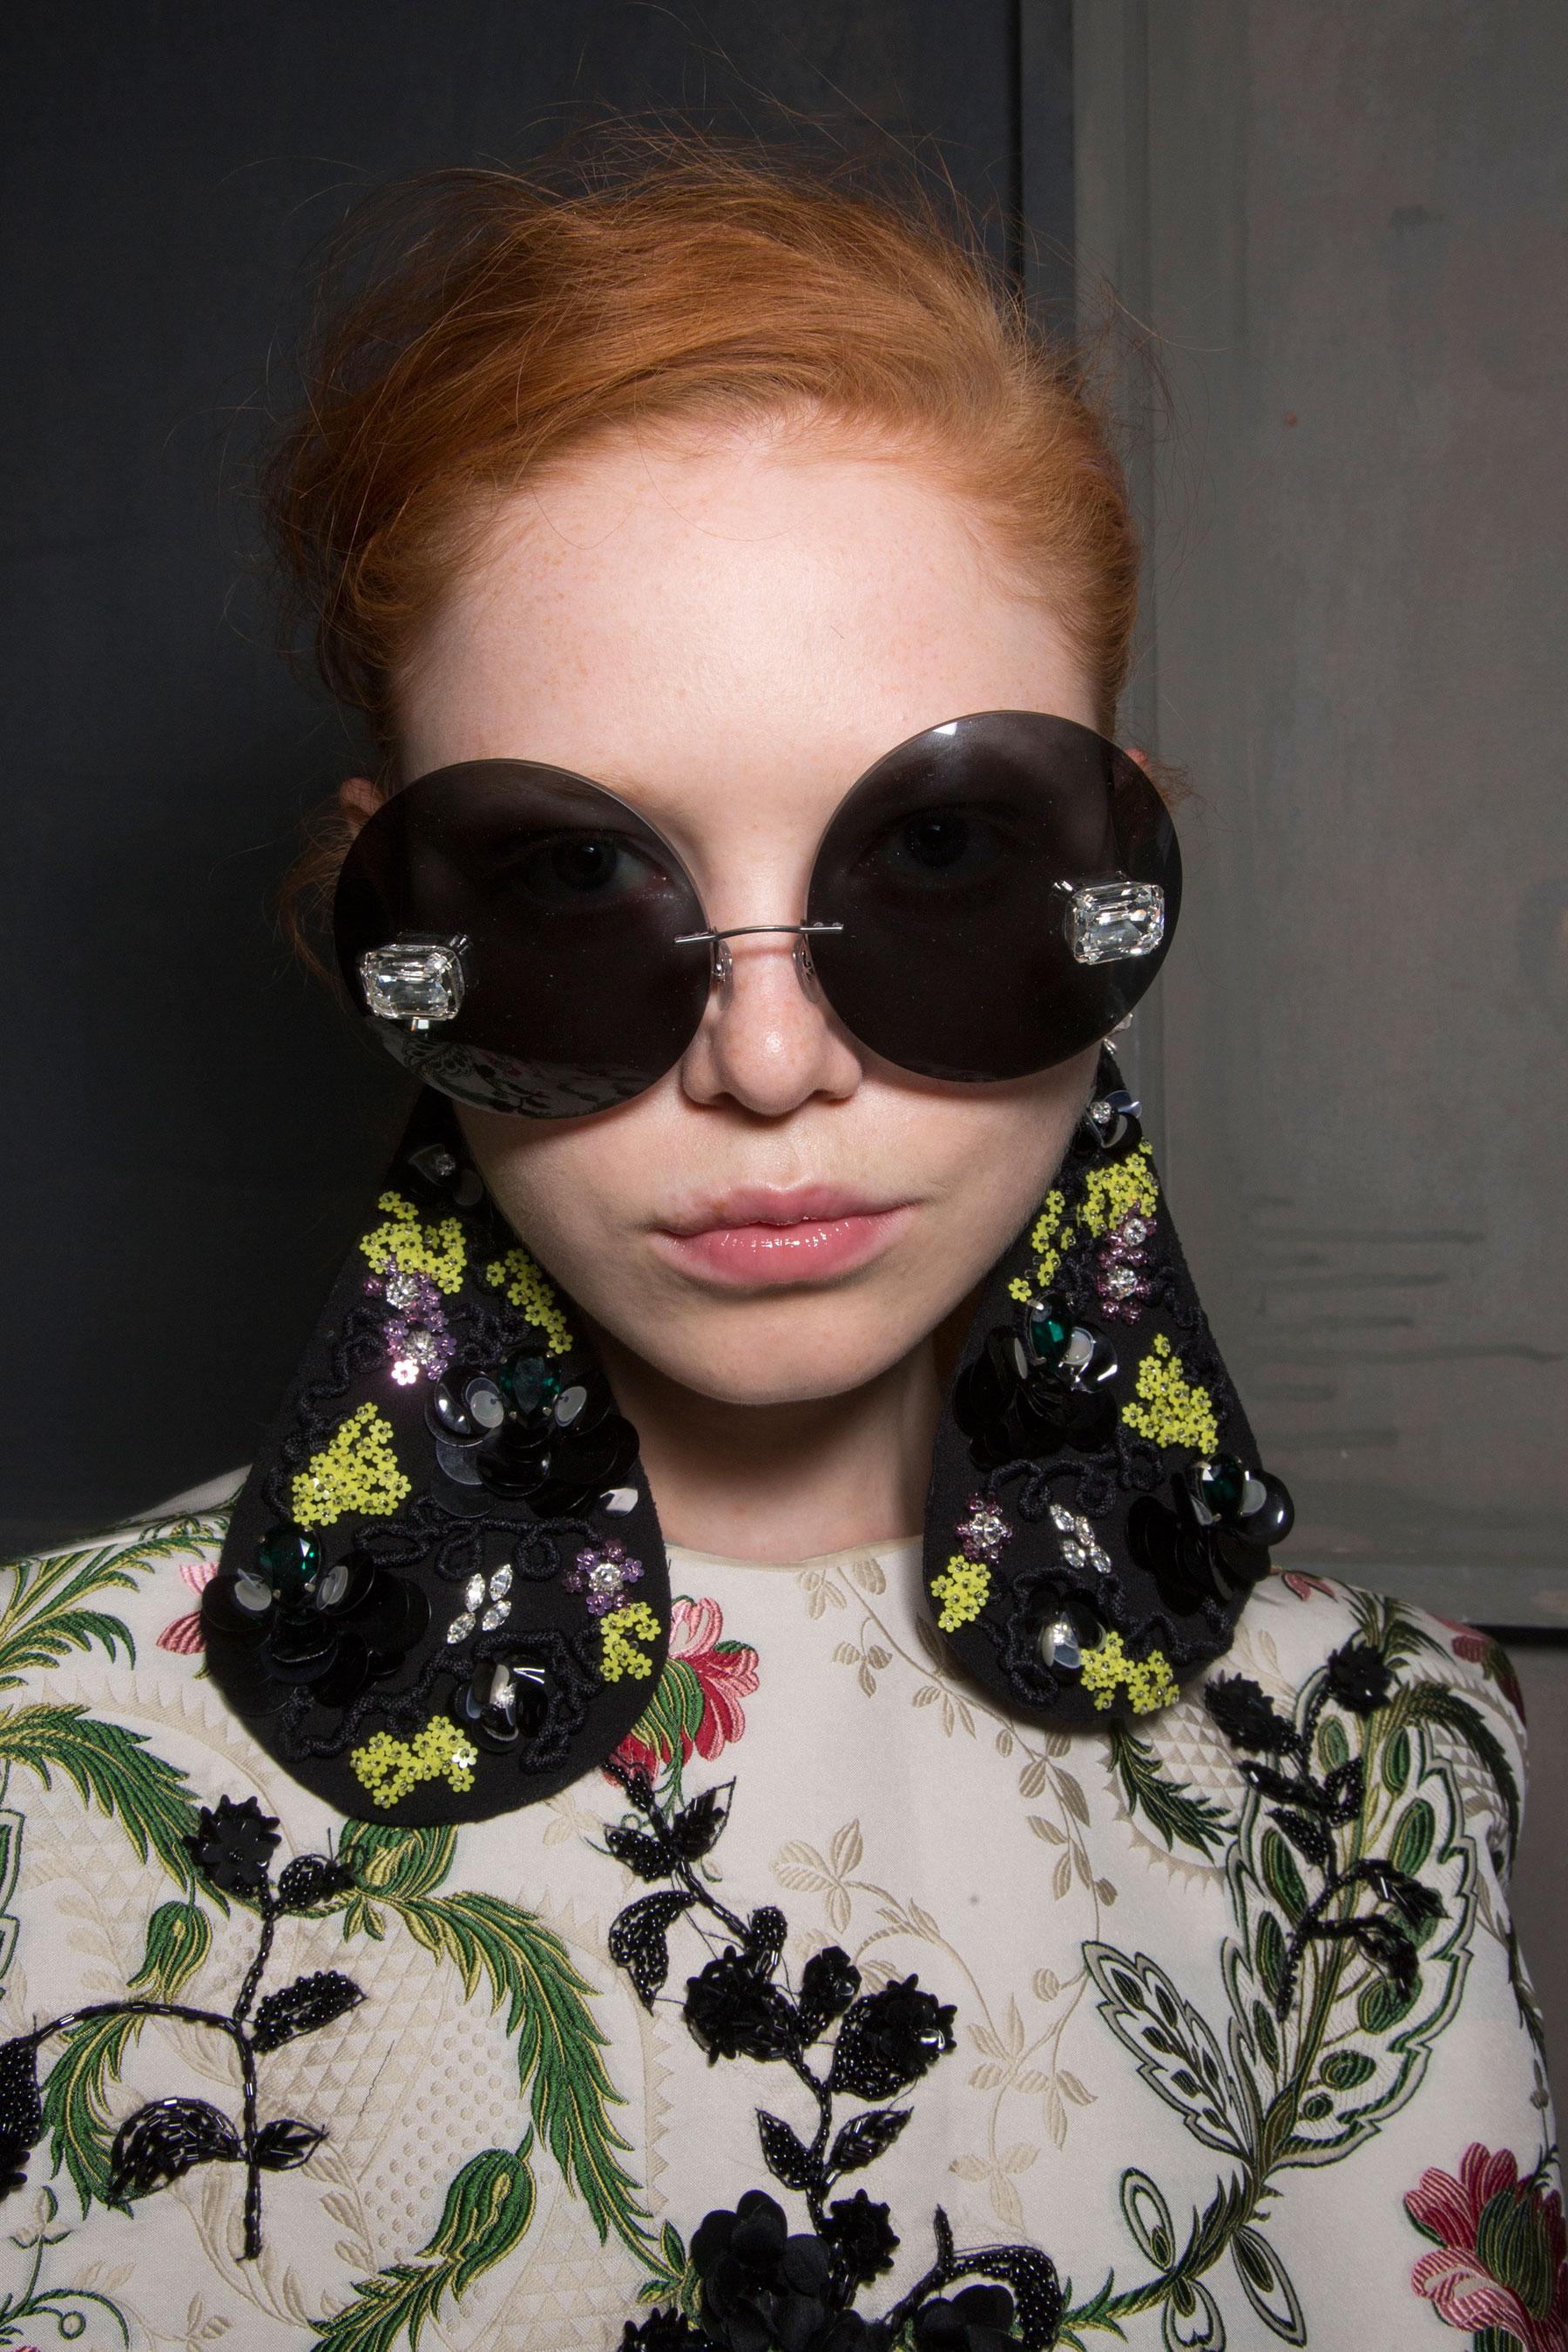 GIAMBATTISTA-VALLI-backstage-fall-2015-couture-the-impression-042